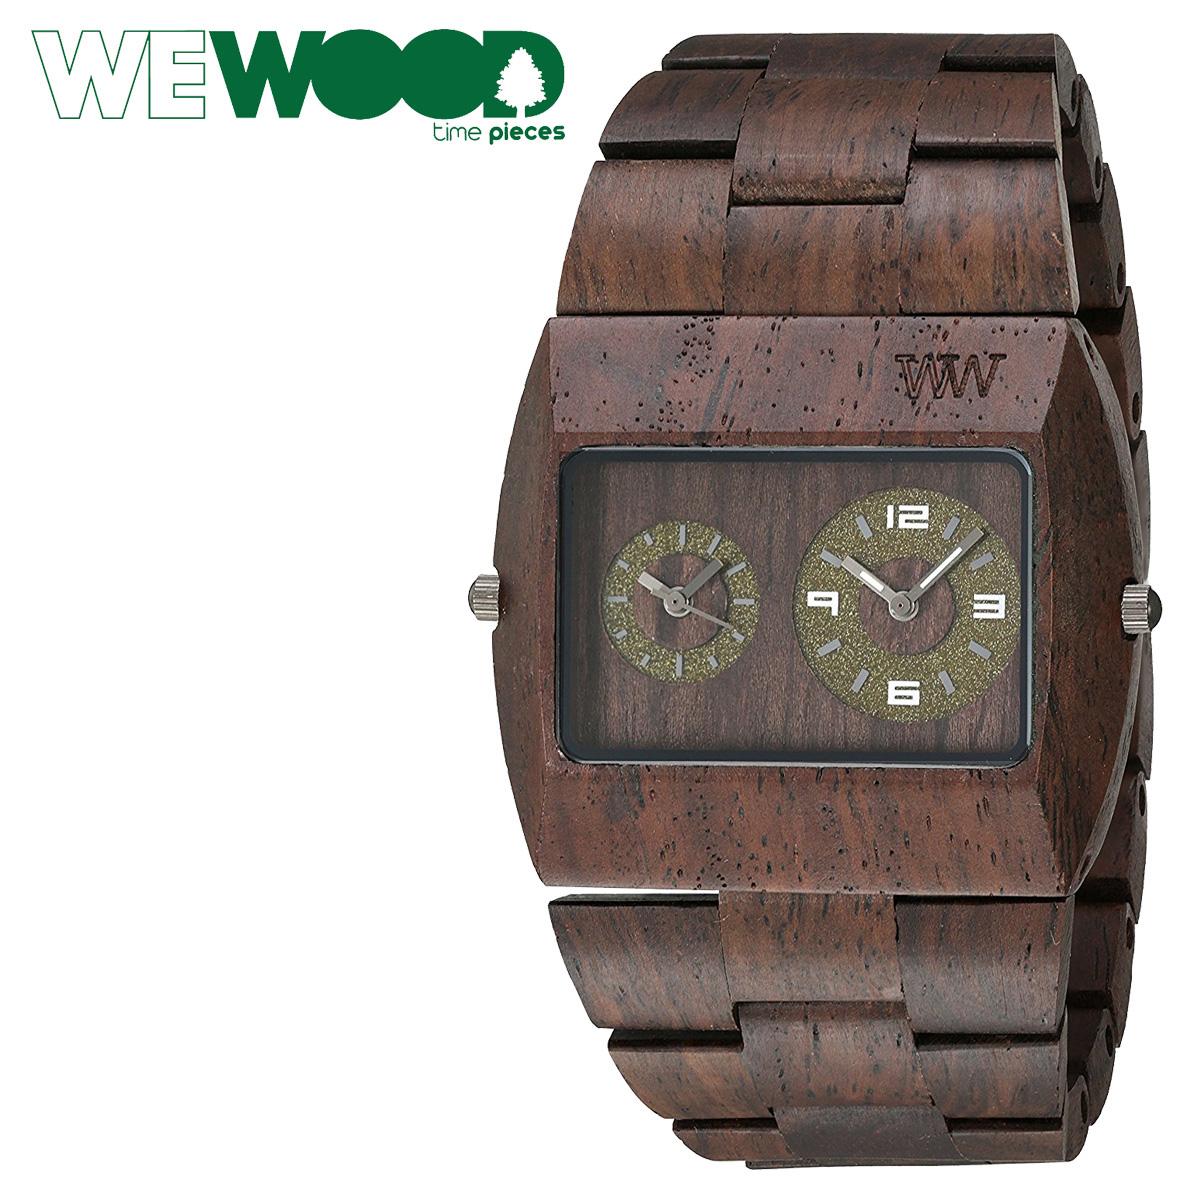 WEWOOD 腕時計 ウィーウッド メンズ レディース JUPITER RS CHOCOLATE WJRSCH ブラウン